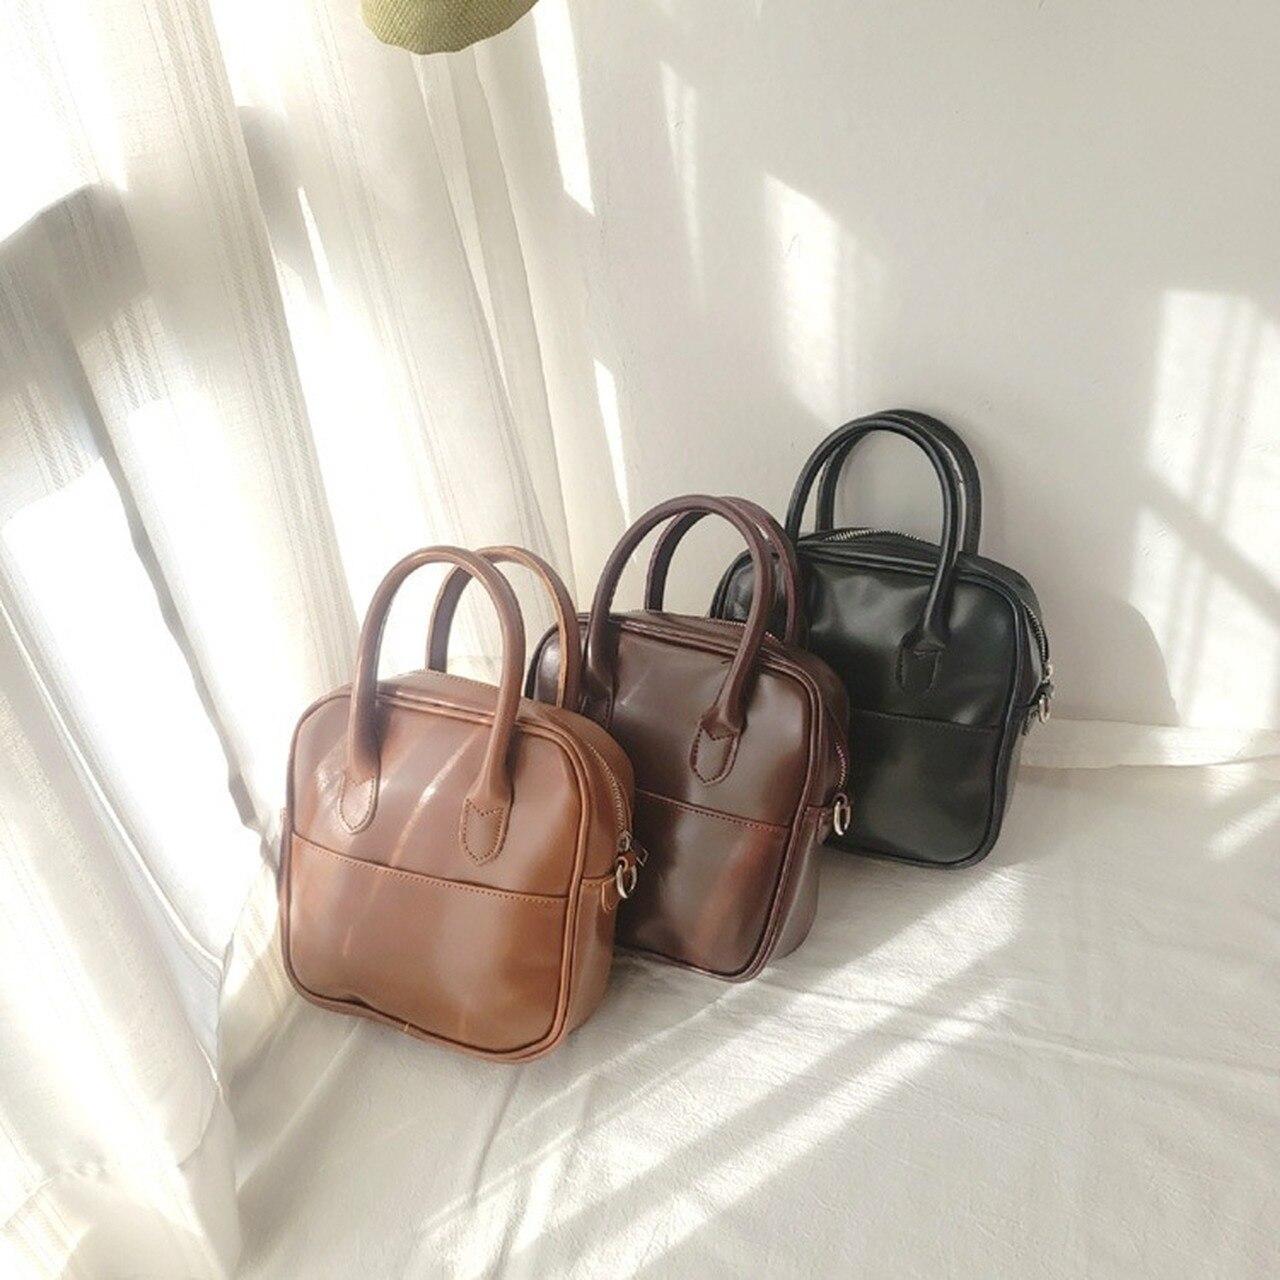 New Style Shoulder Bag South Korea Hand Square Sling Bag Single-shoulder Crossbody Bag Retro WOMEN'S Bag clutch bag